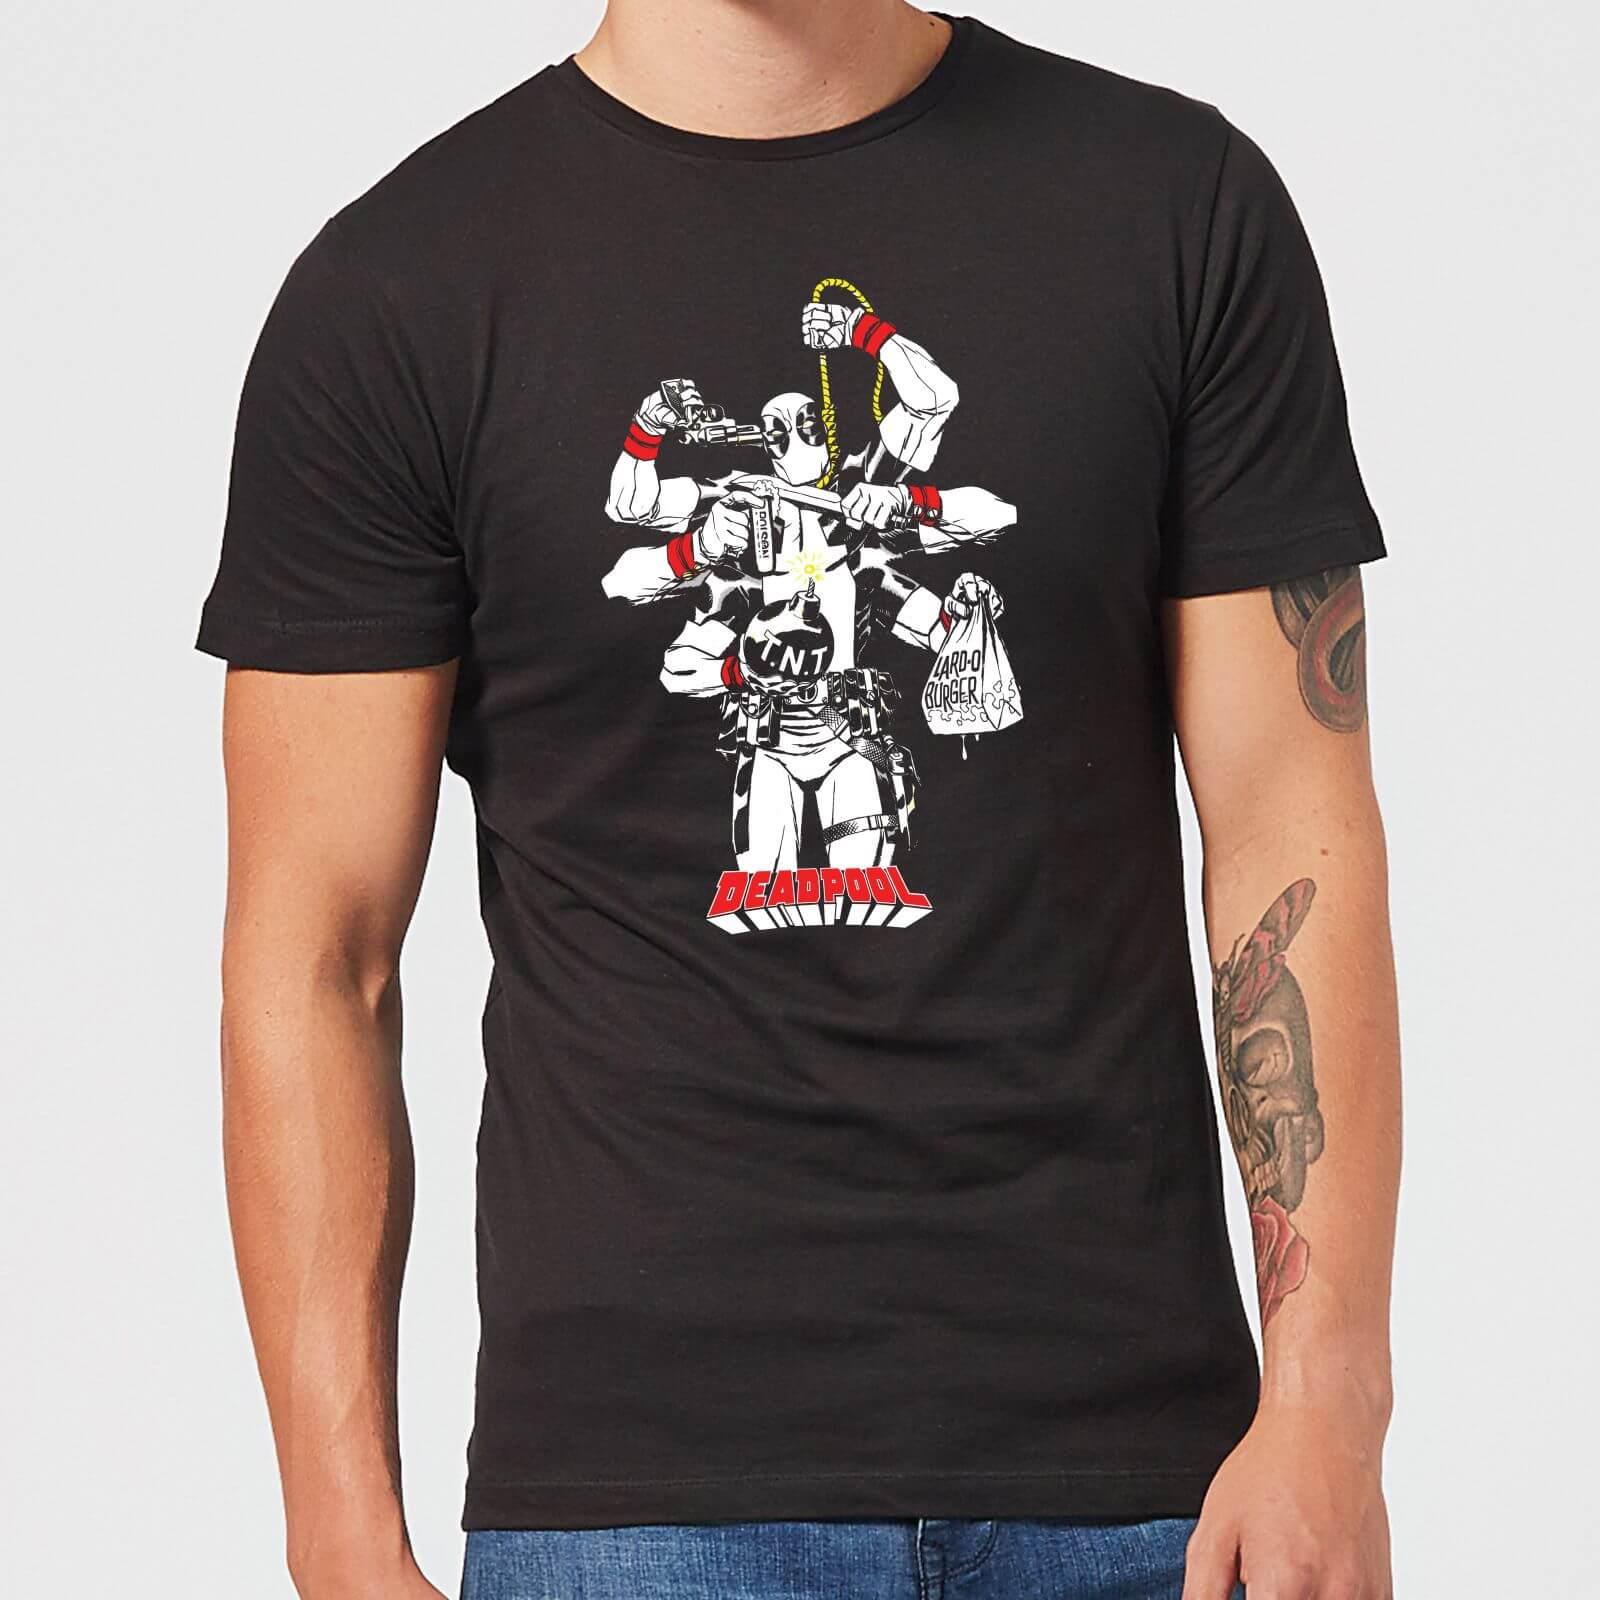 OfferteWeb.click 27-t-shirt-marvel-deadpool-multitasking-nero-uomo-l